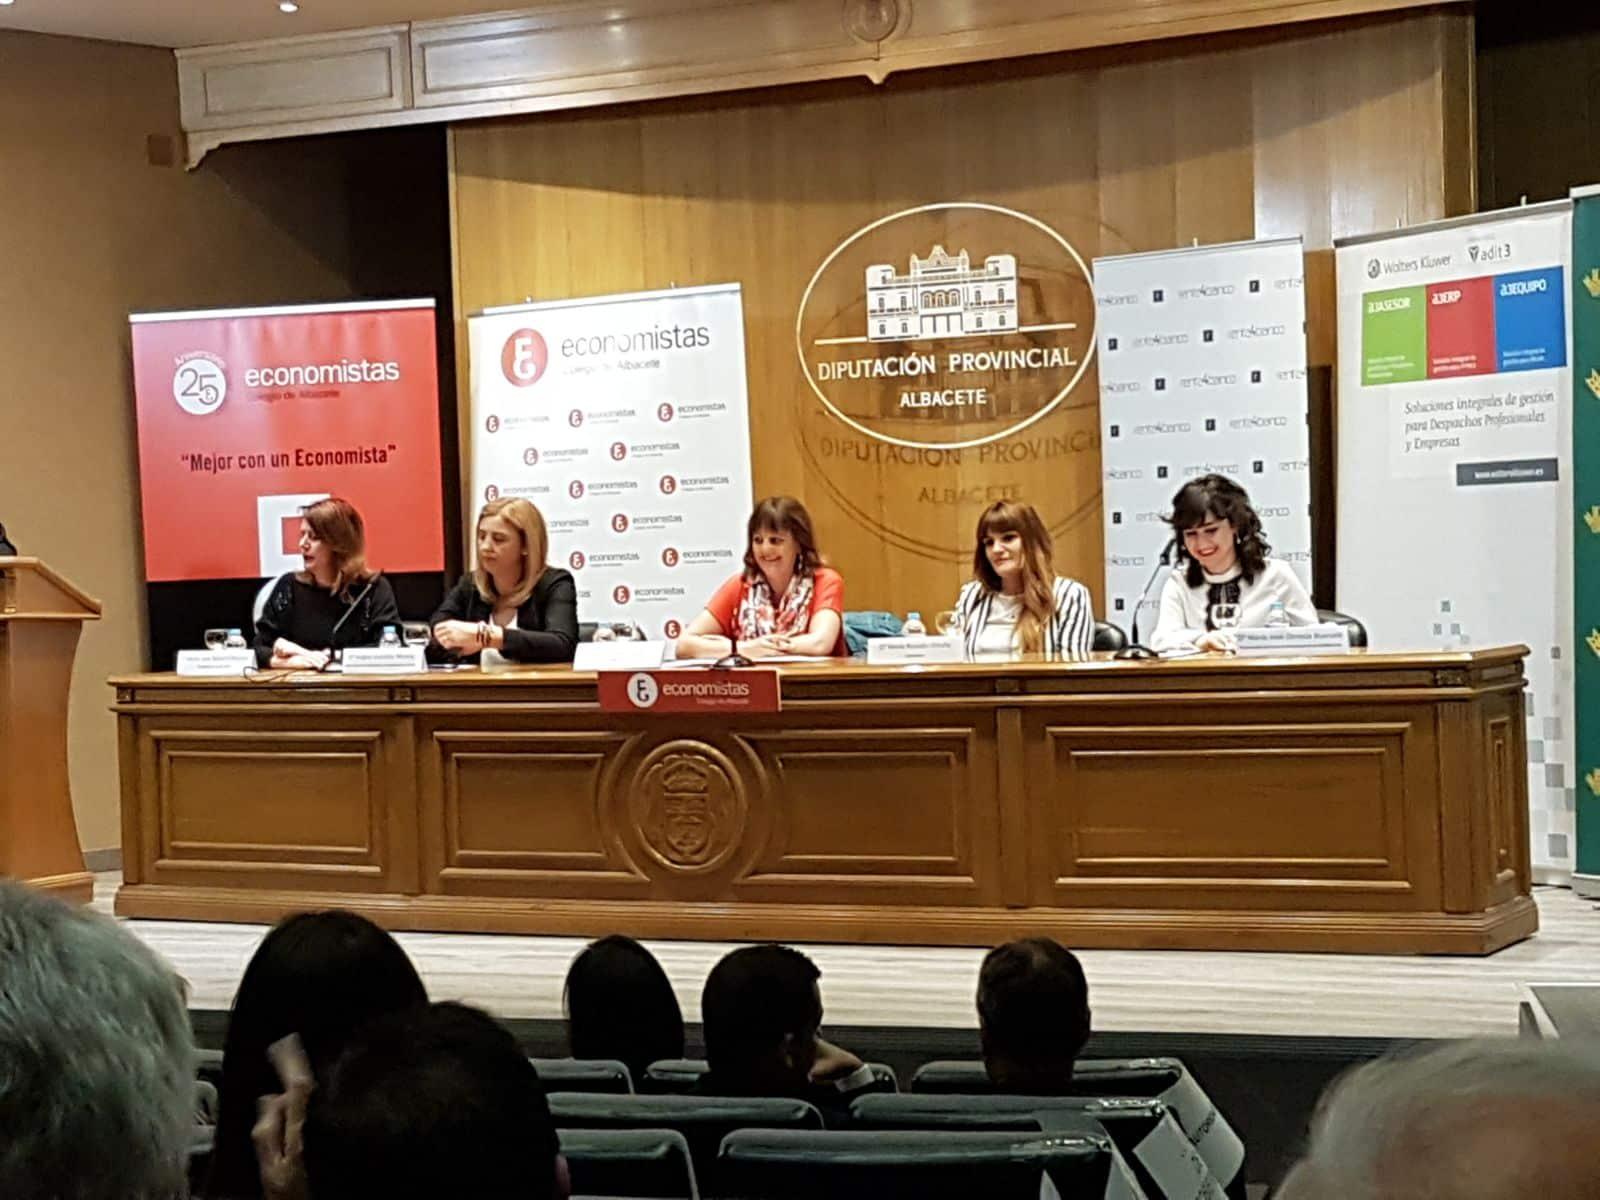 https://blog.globalcaja.es/wp-content/uploads/2018/04/foro-mujeres-responsabilidad.jpg